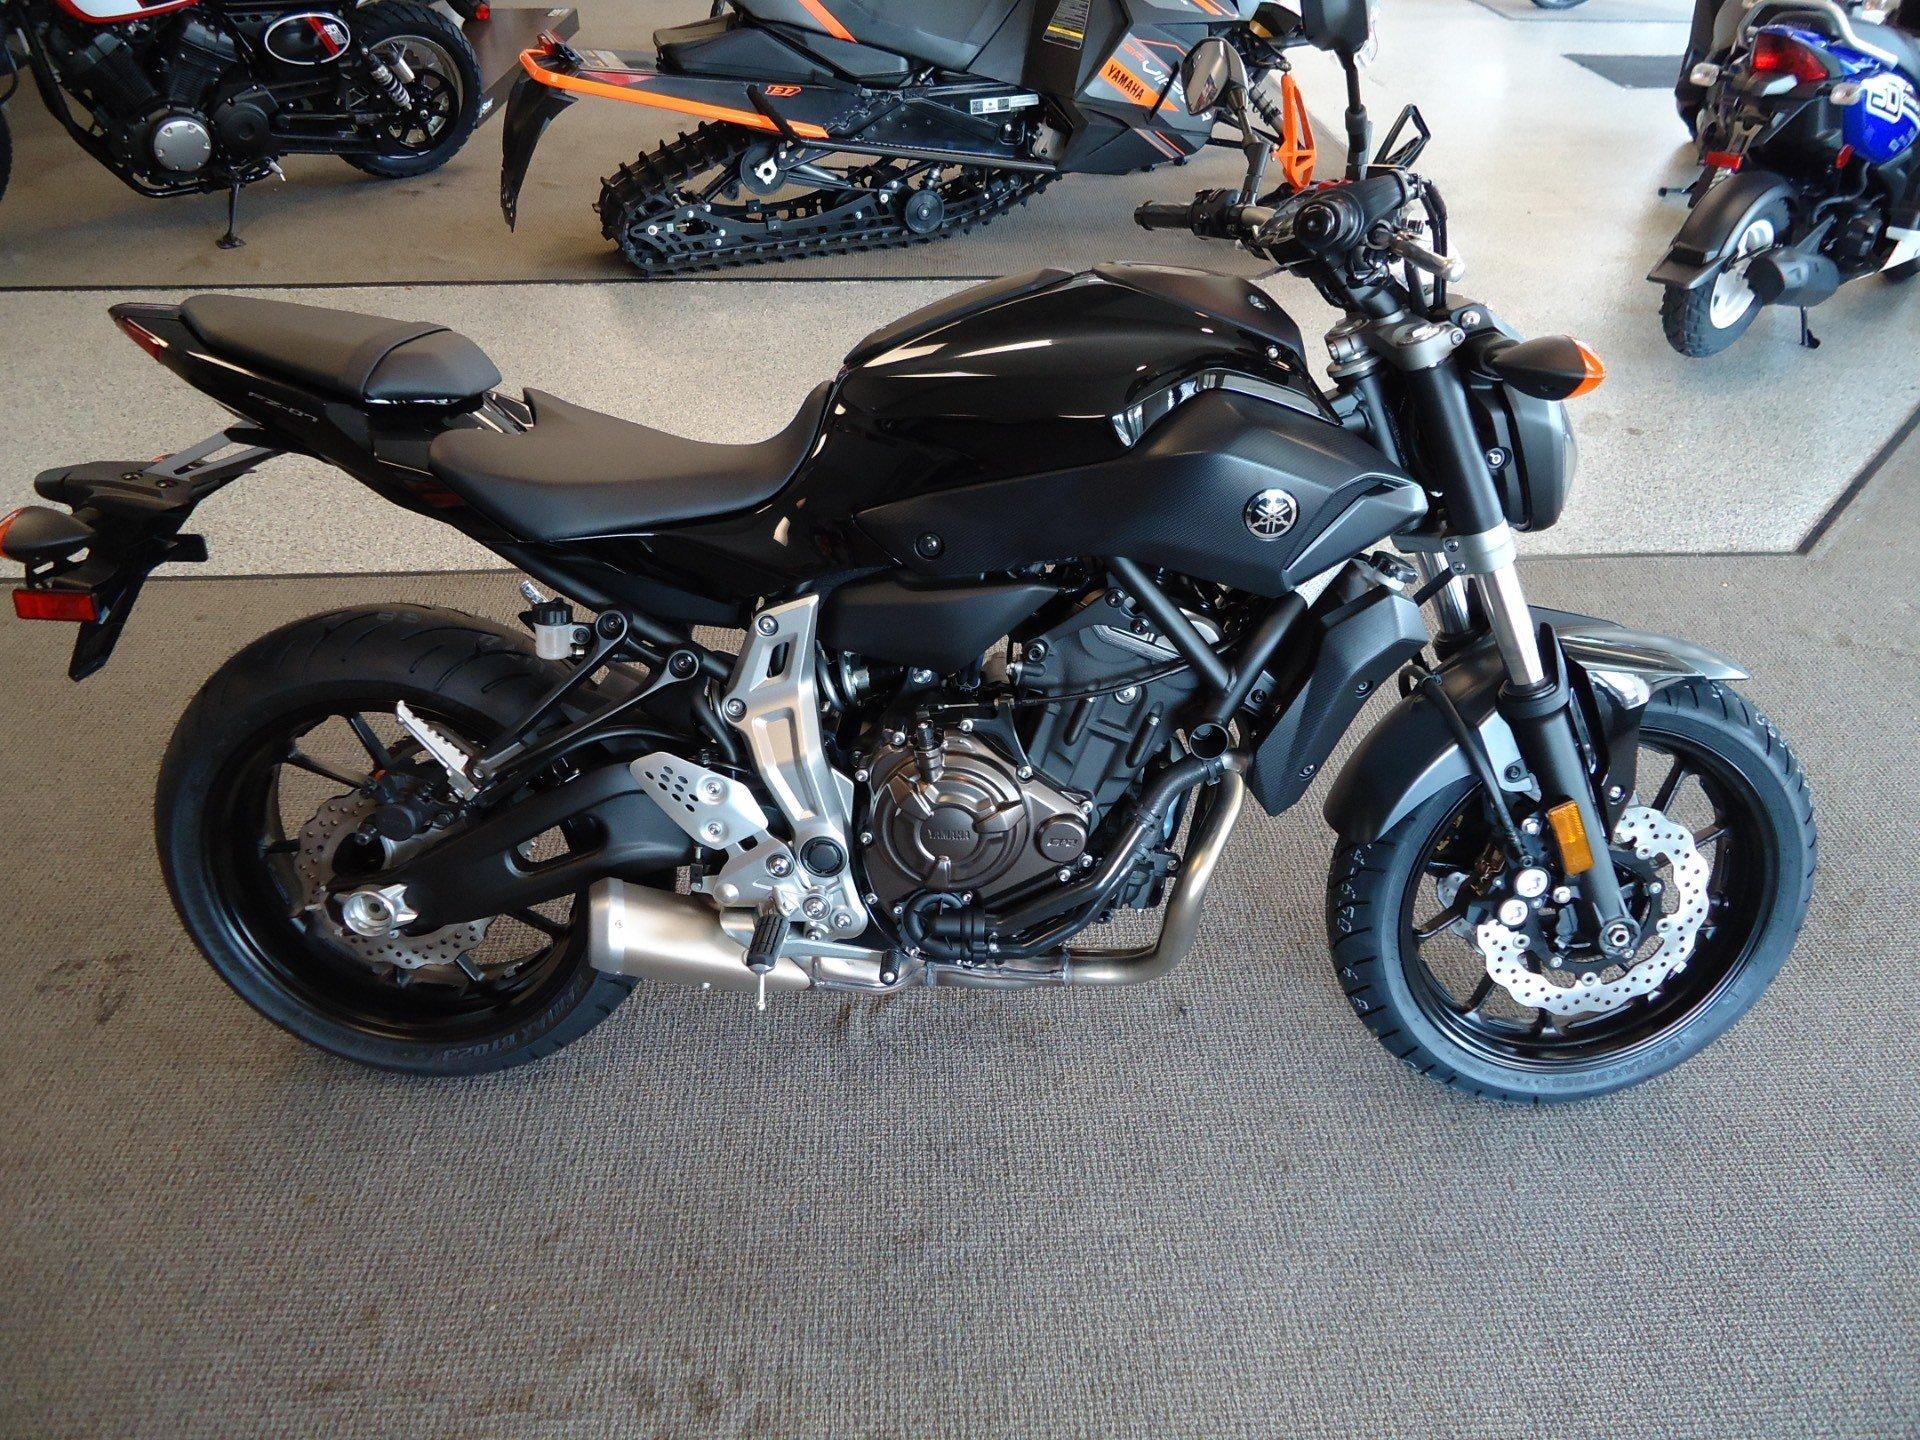 2016 Yamaha FZ-07 for sale 52916